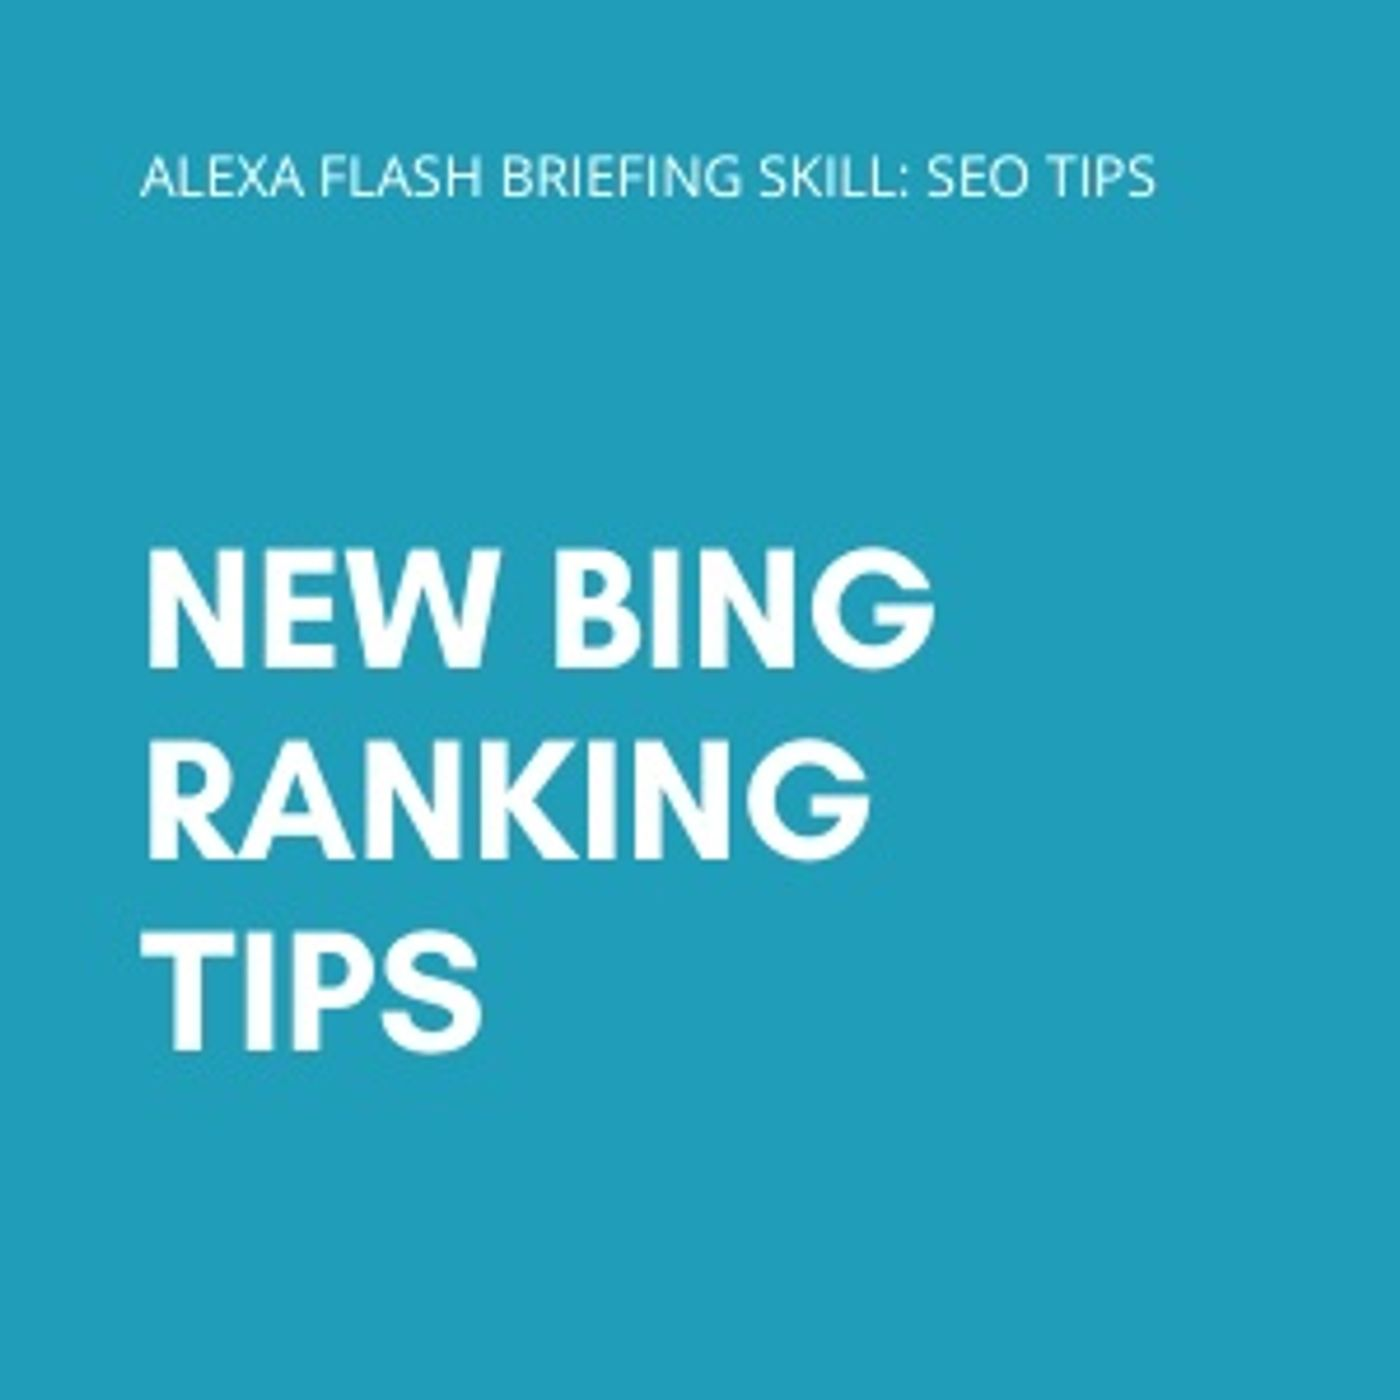 New Bing ranking tips